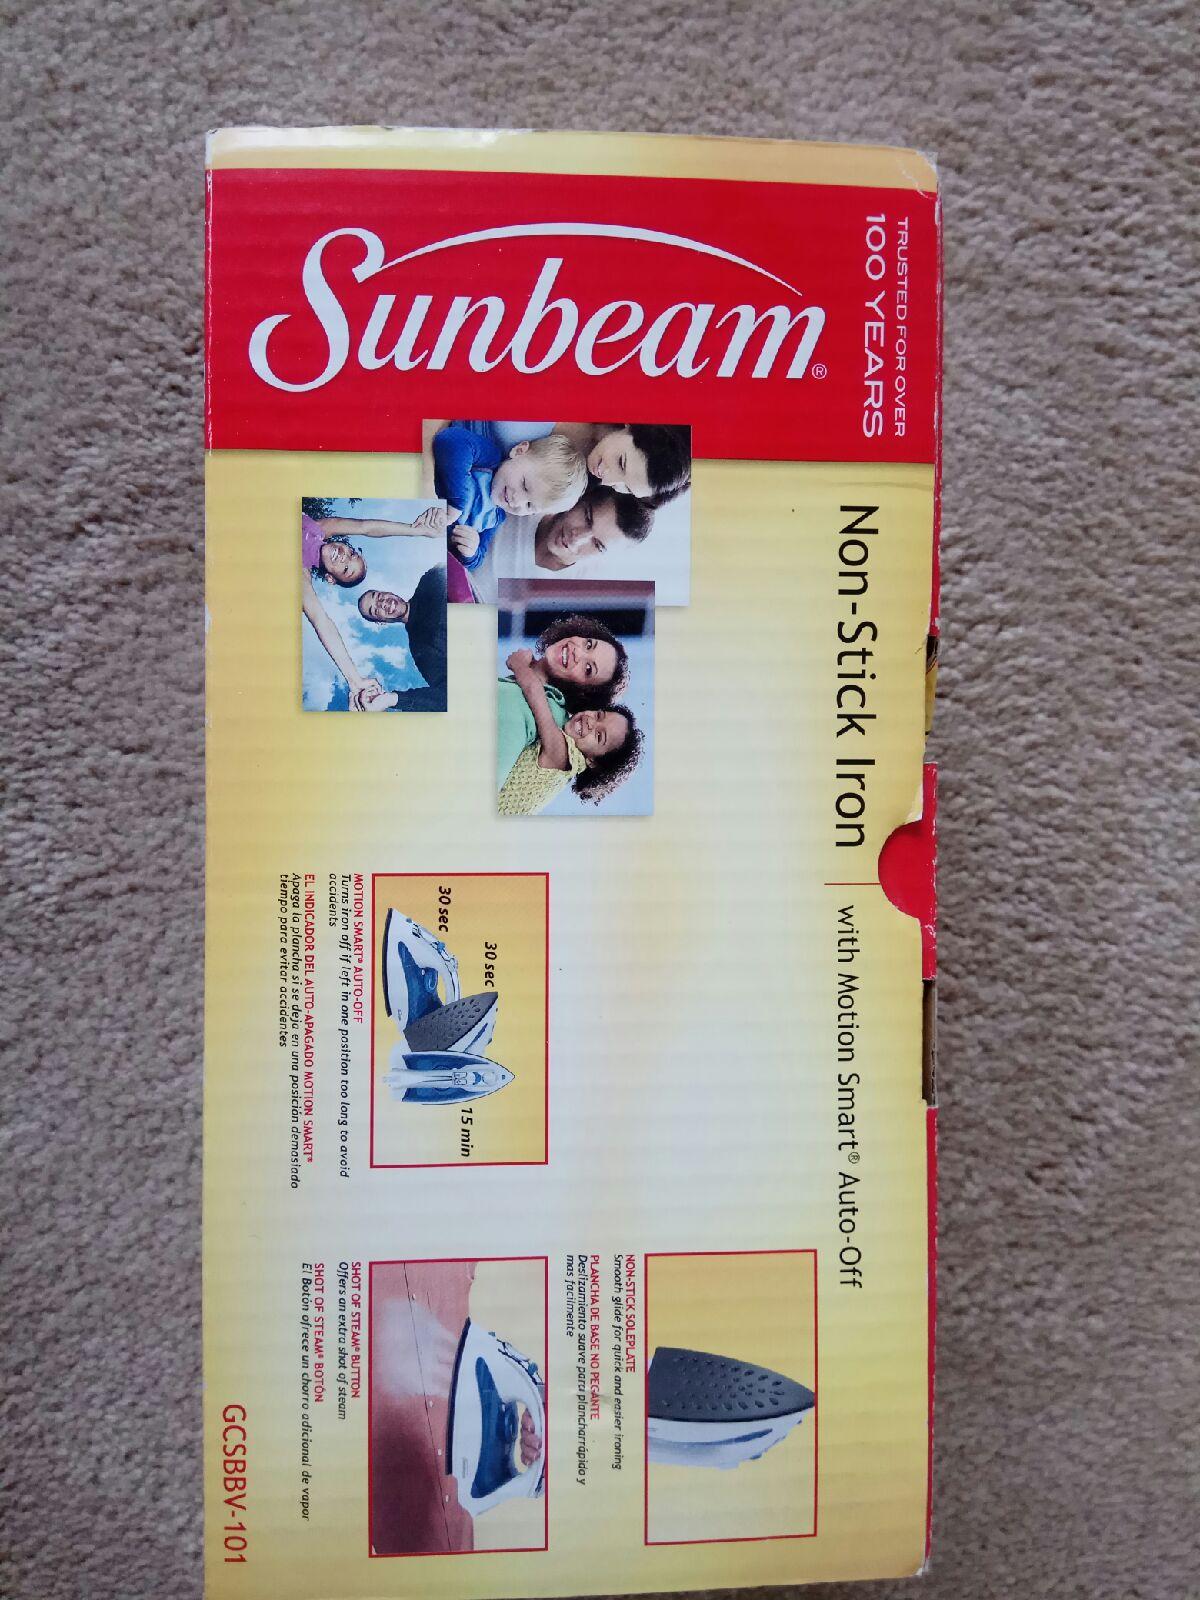 Sunbeam Professional Steam Iron